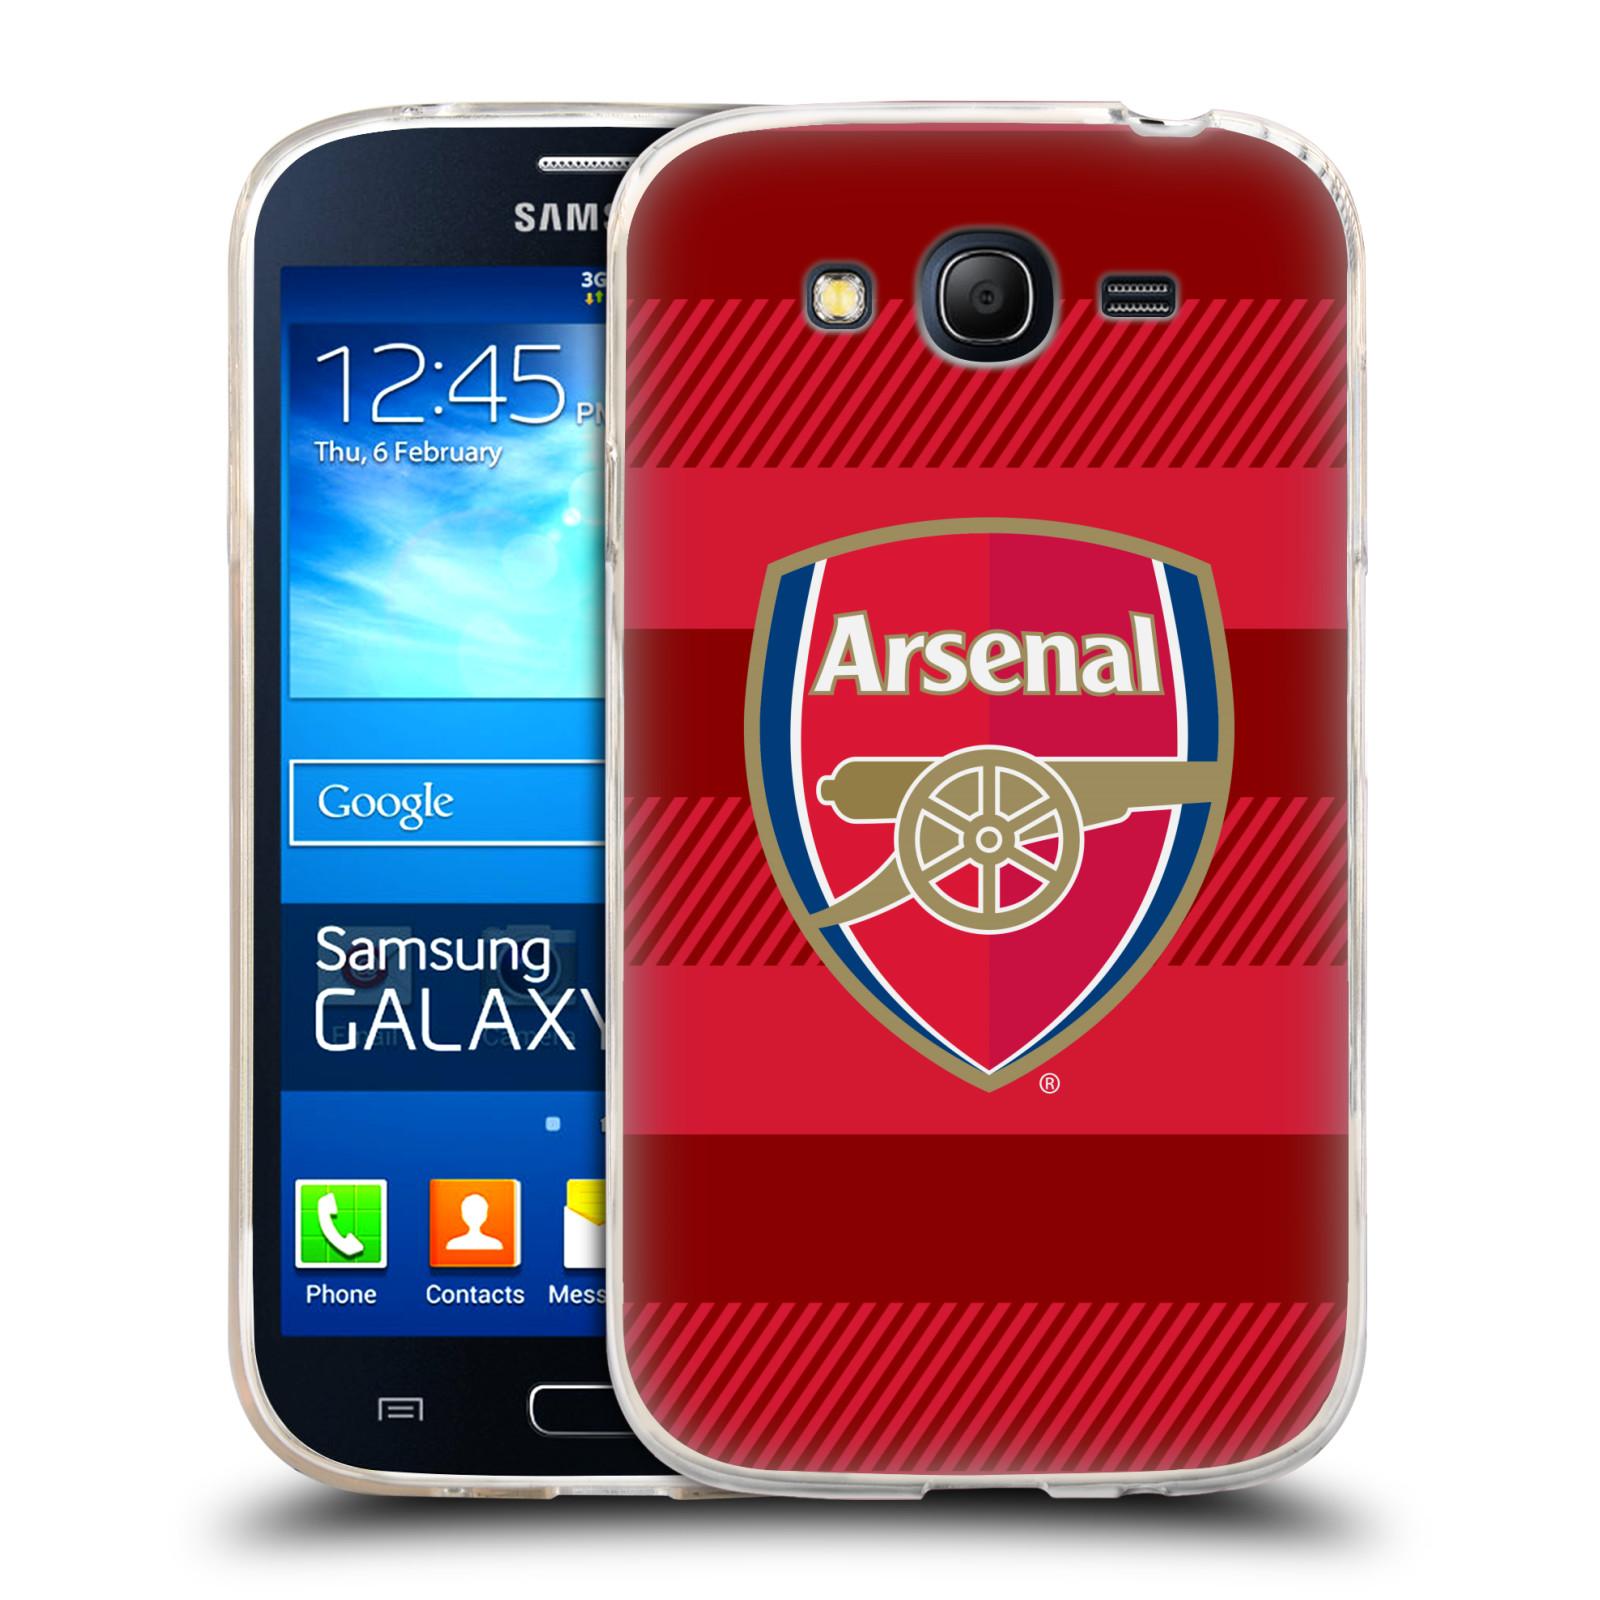 Silikonové pouzdro na mobil Samsung Galaxy Grand Neo - Head Case - Arsenal FC - Logo s pruhy